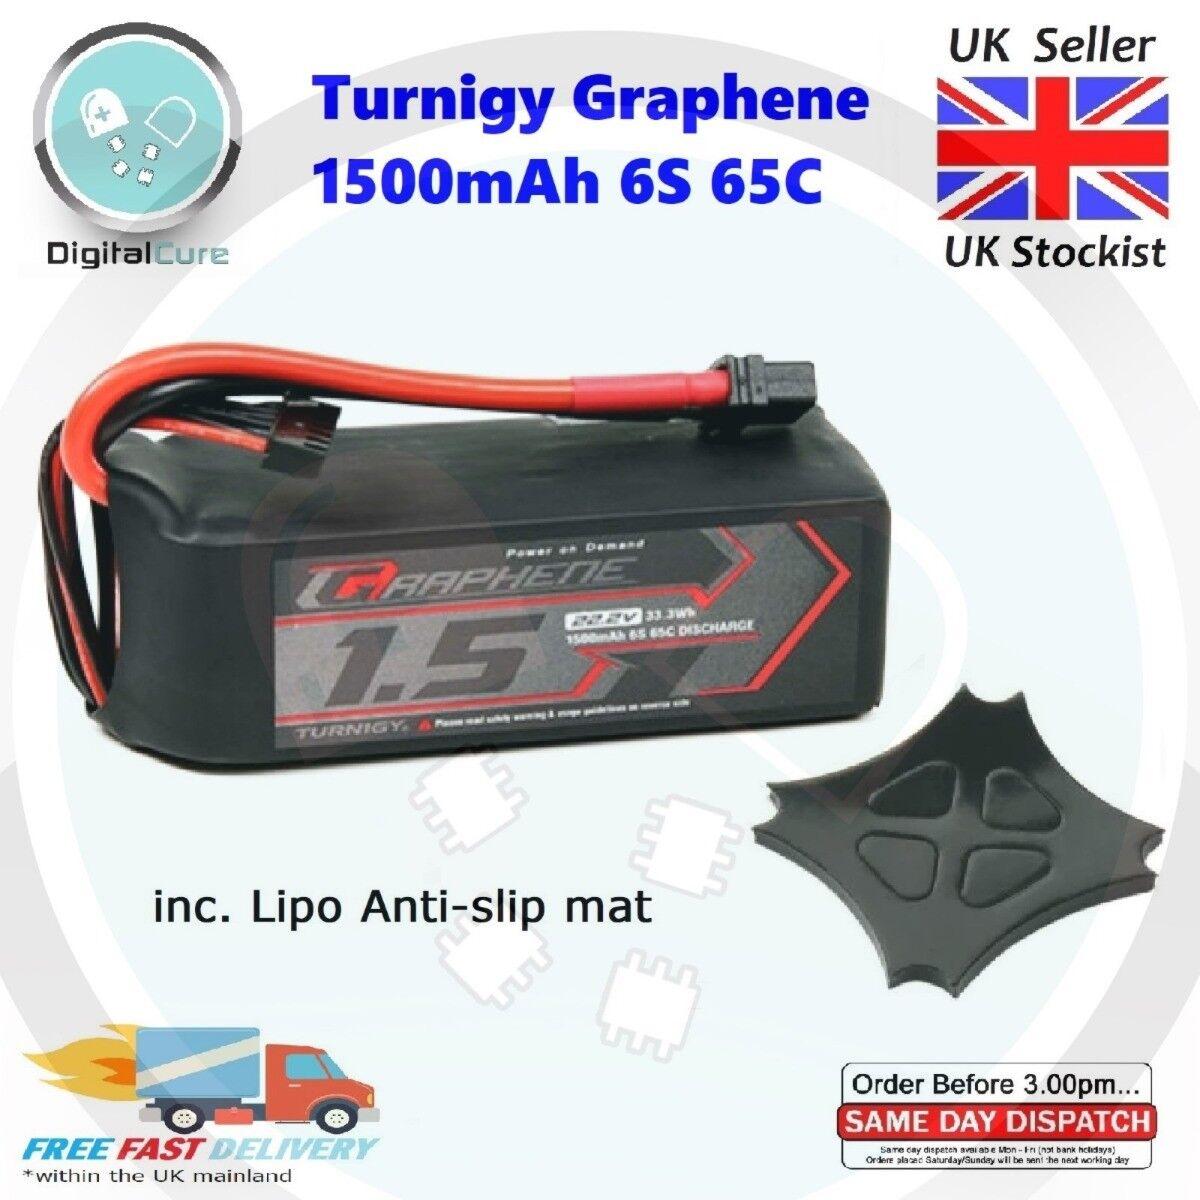 Turnigy Graphene 1500mAh 22.2V 6S 65C-130C LiPo Battery XT60-not 1800 1300 4S 5S